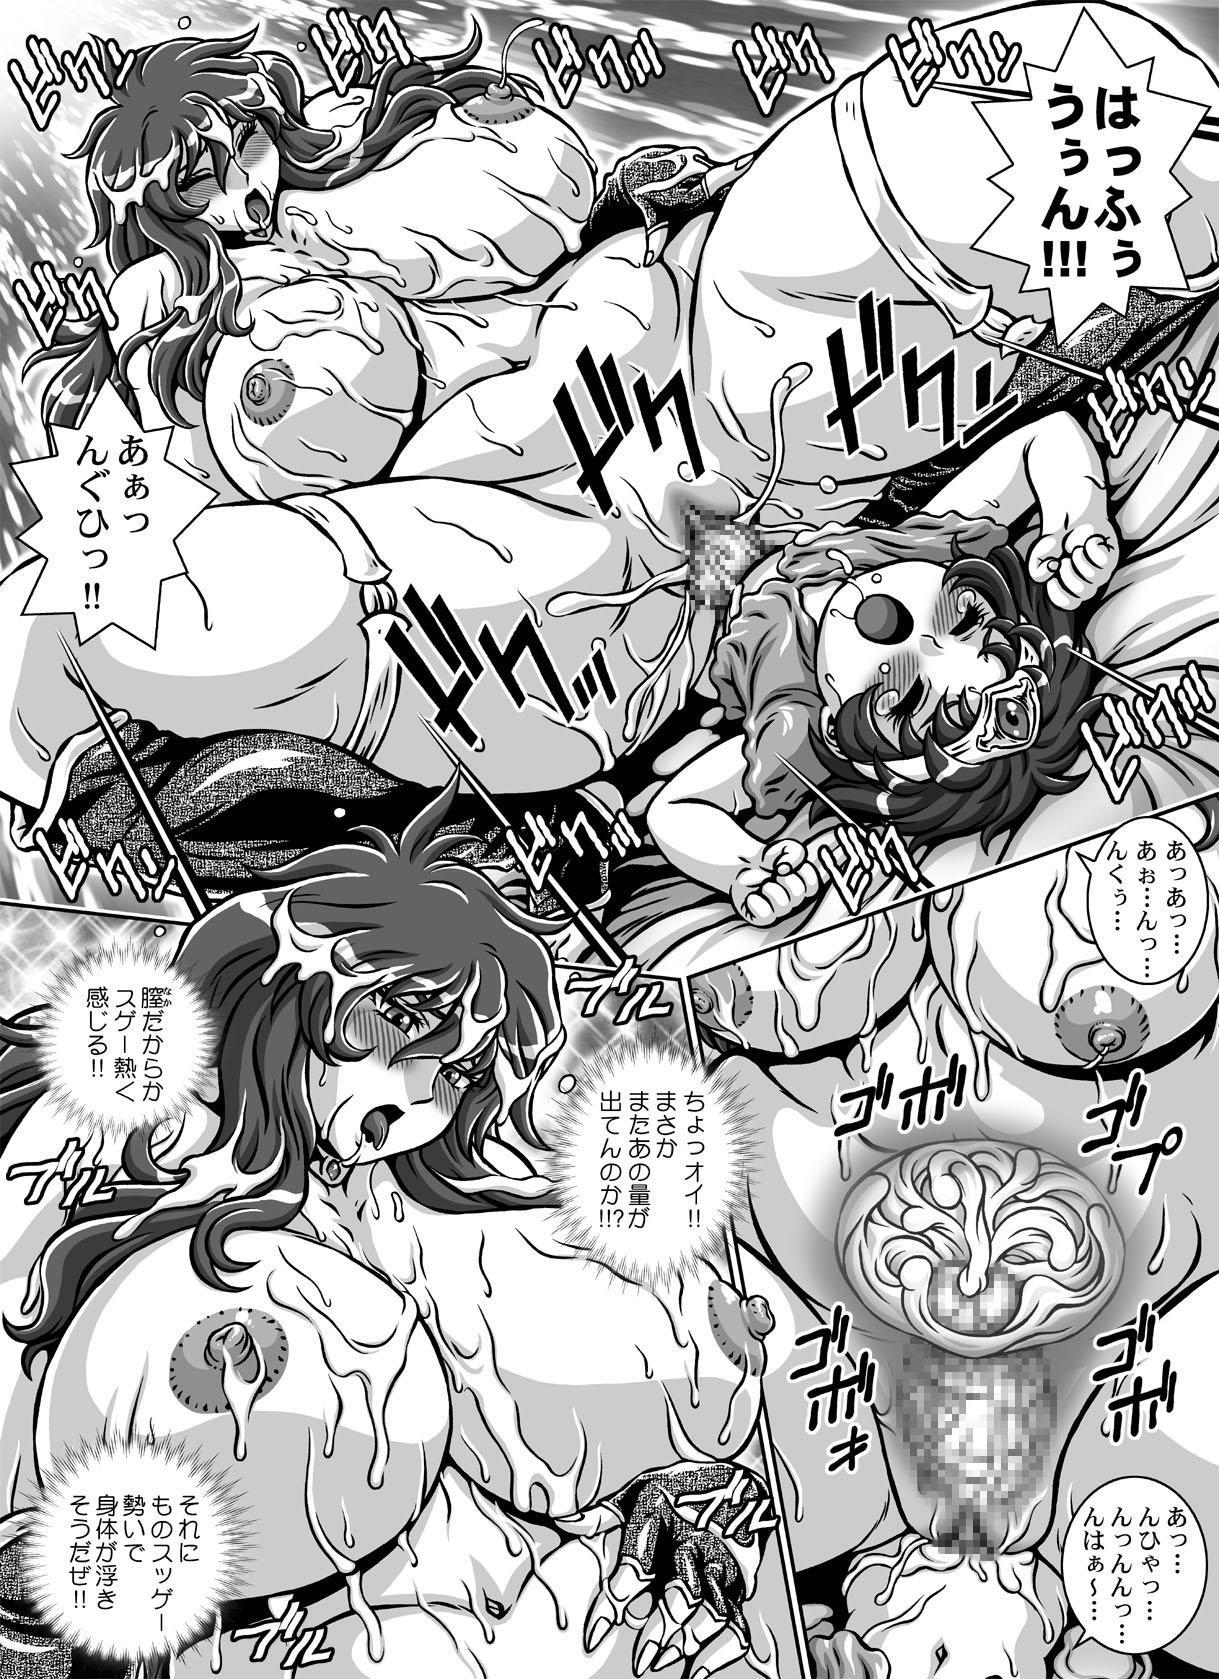 [Naginata-kan (Matsurino Naginata)] D-Q-R ~PROOF OF THE HERO~ (Dragon Quest III) [Digital] 44